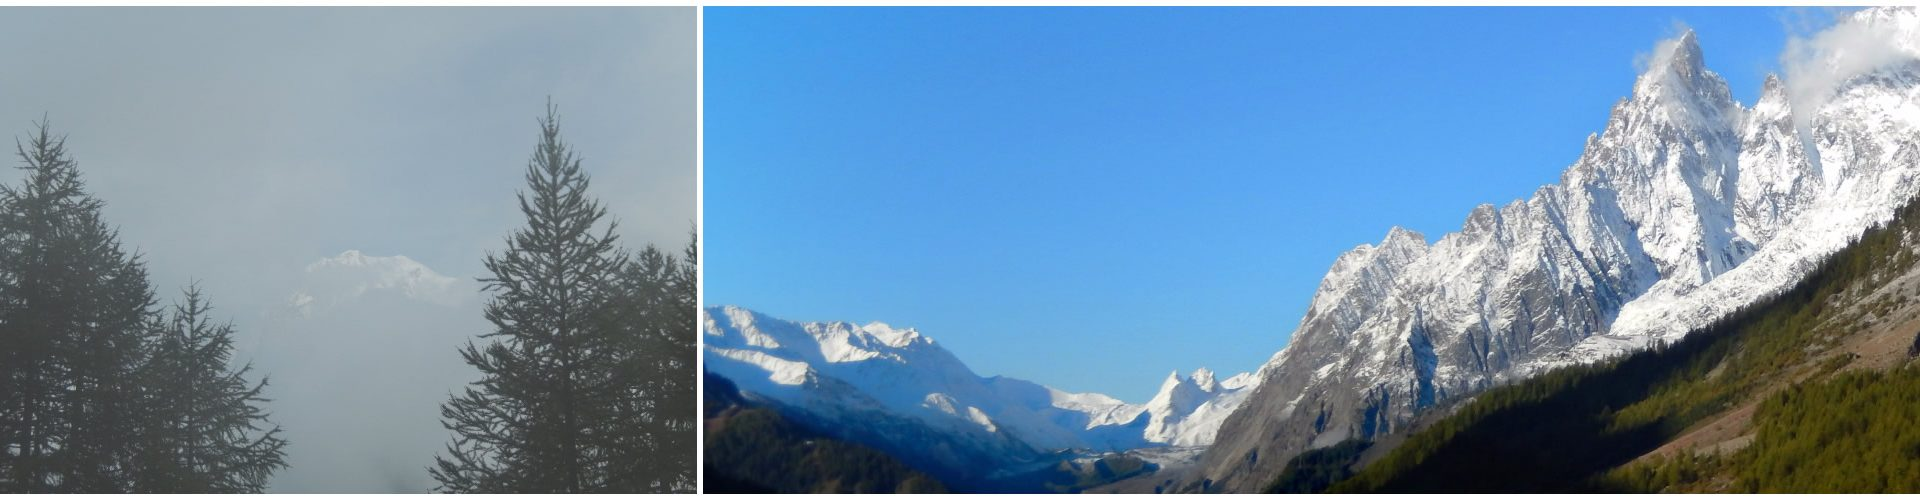 Il Bianco da Val Sapin. Il Bianco dal Malatrà.